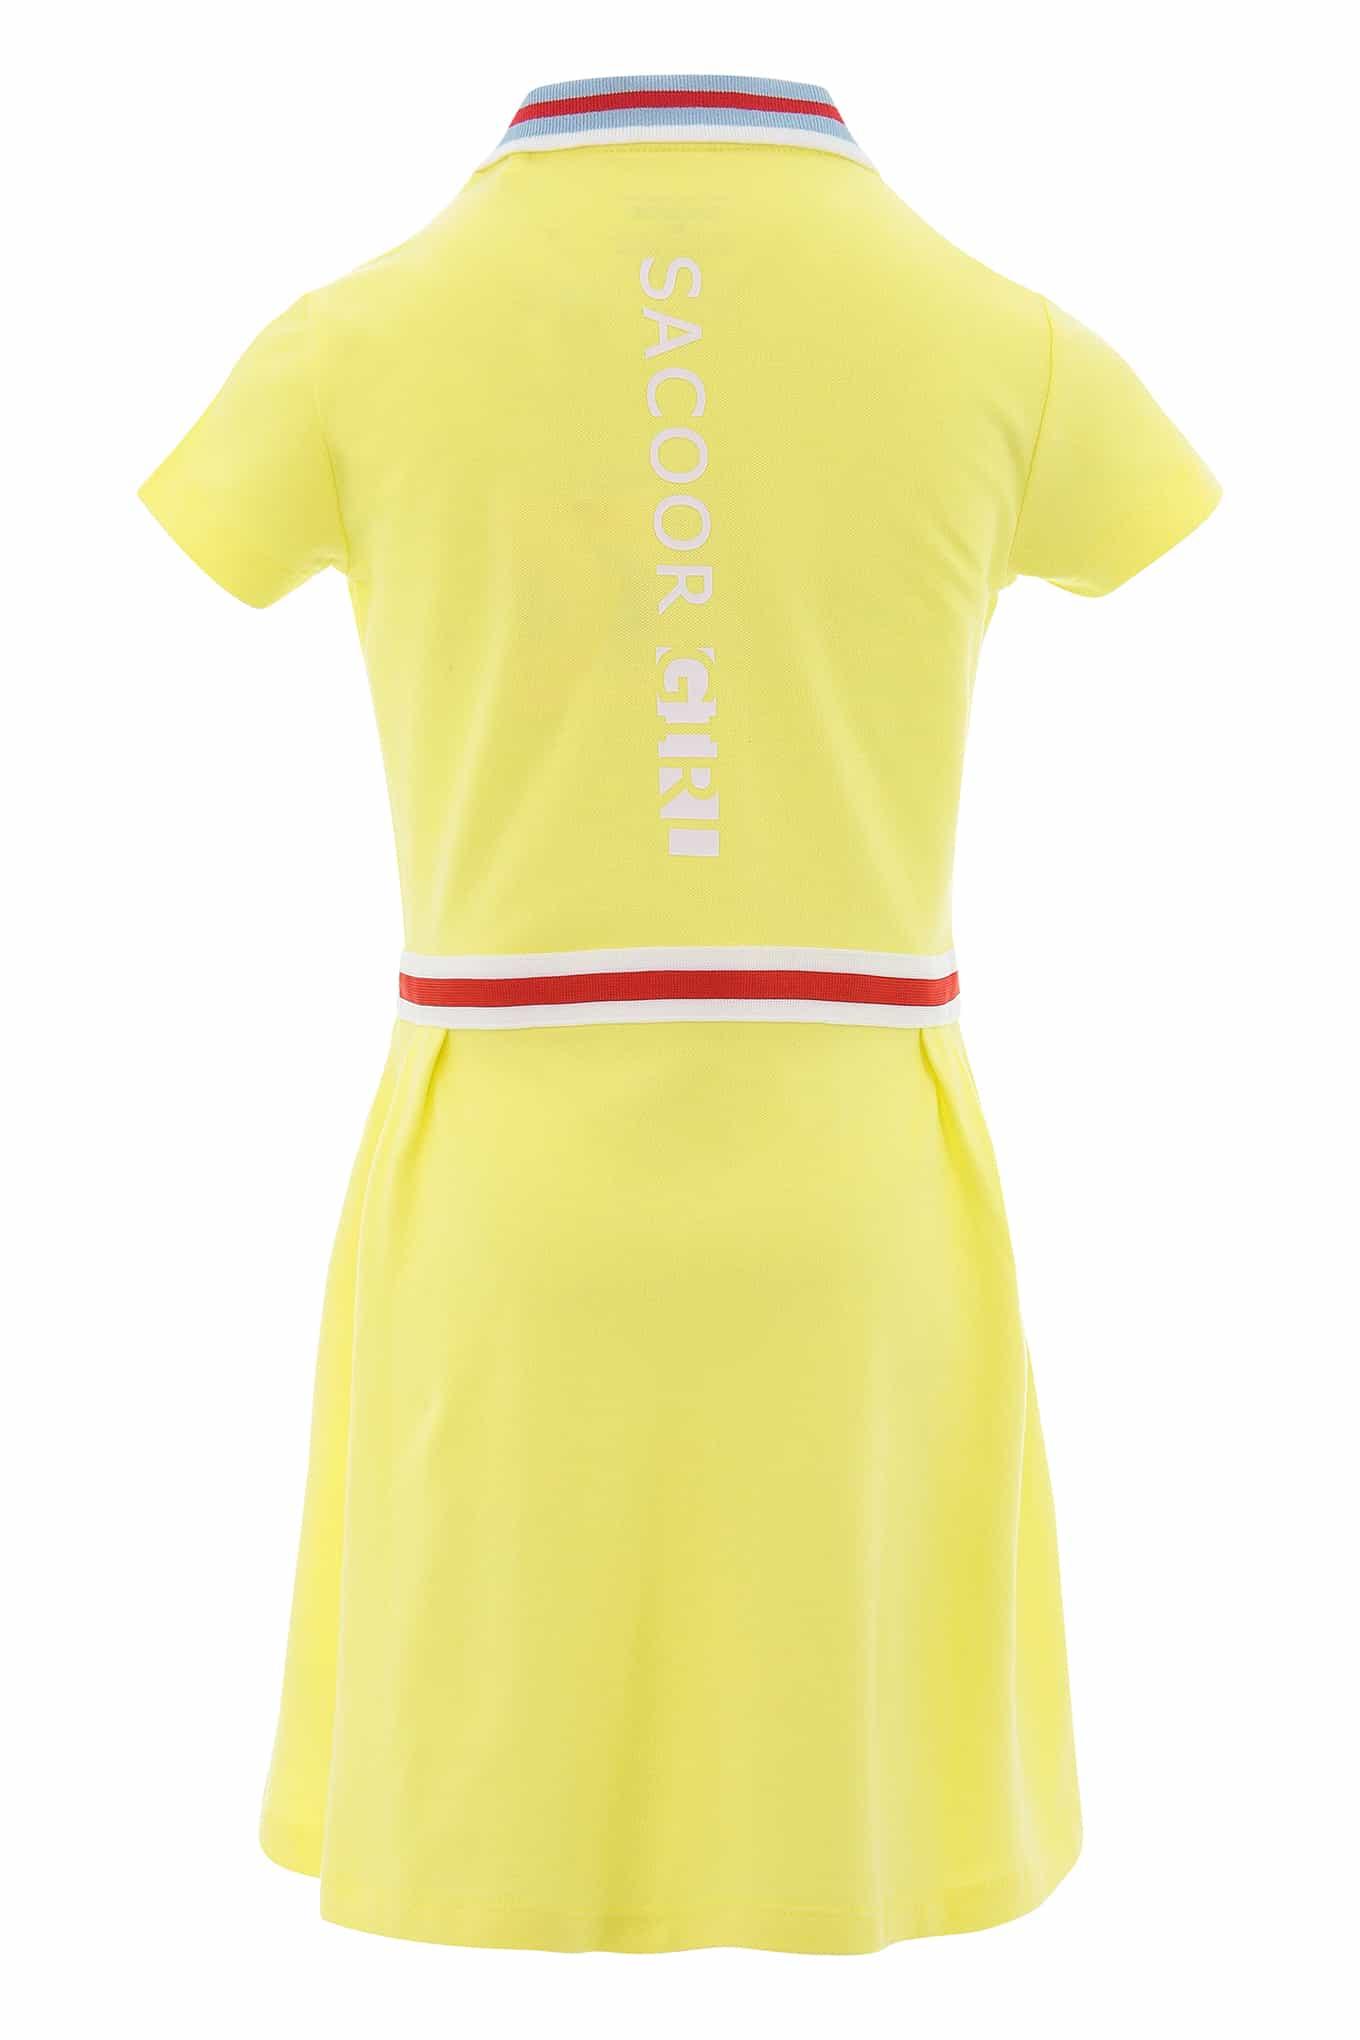 Vestido Piquet Limonada Sport Rapariga